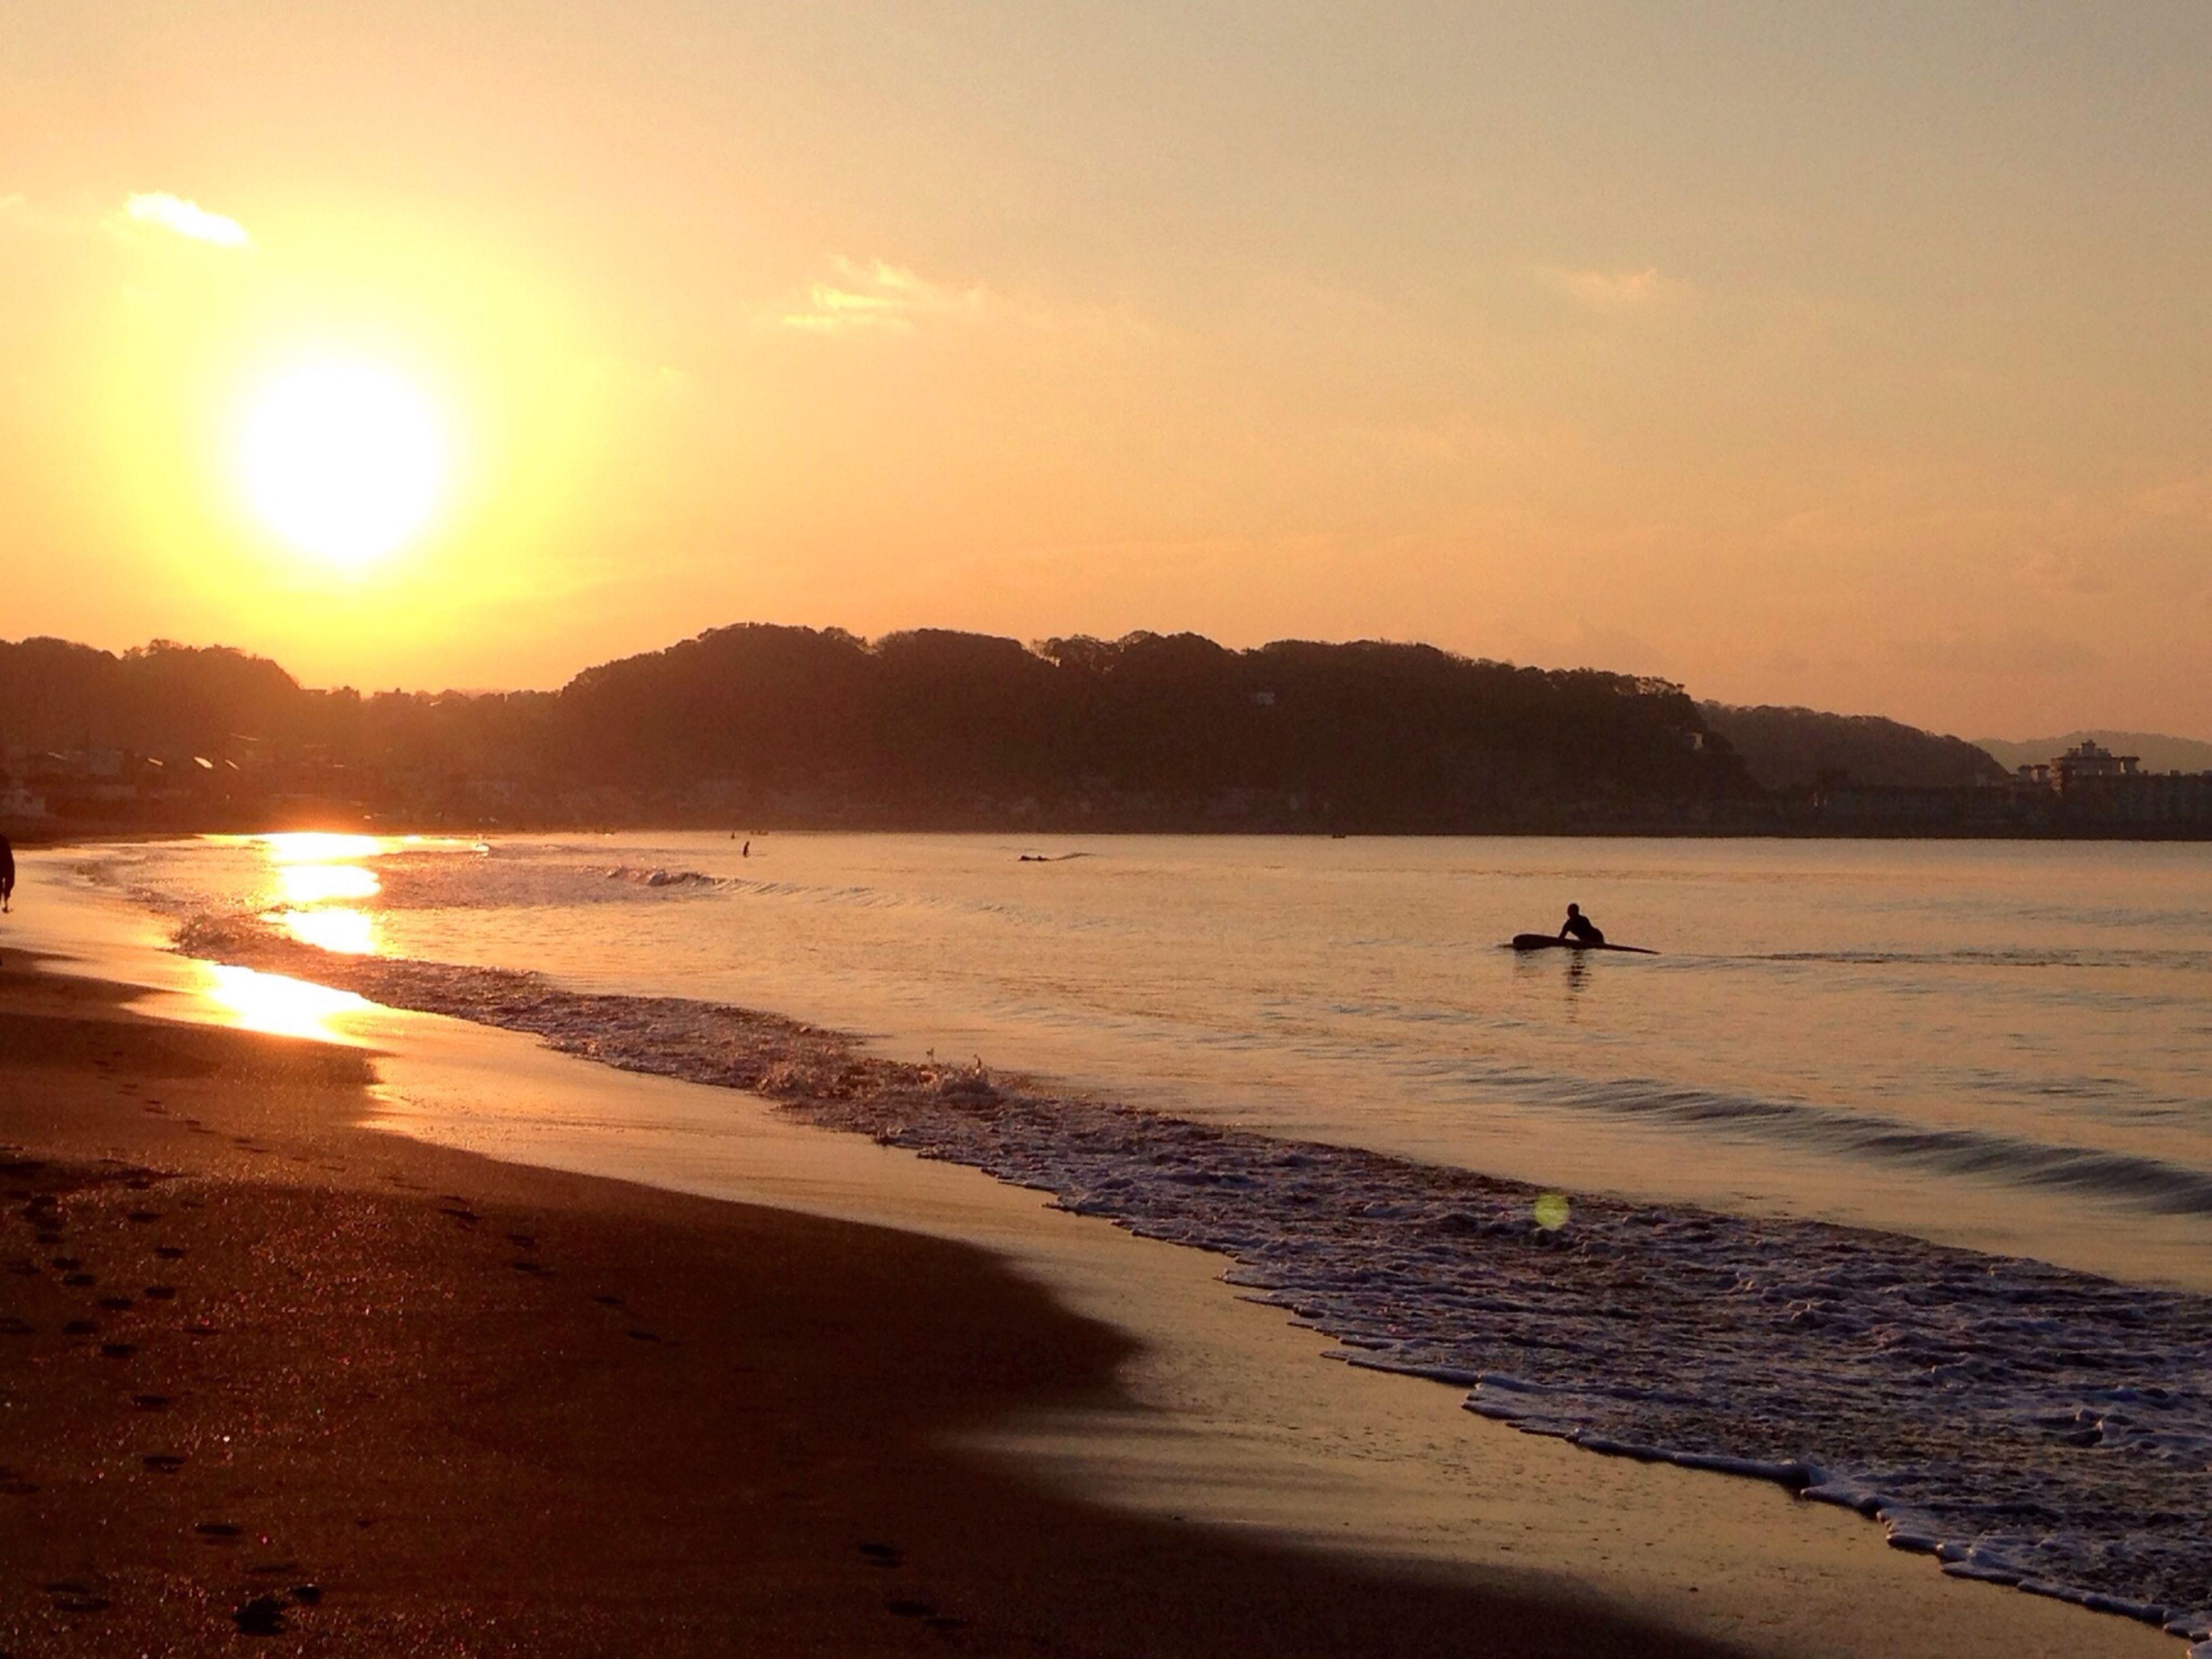 sunset, water, sea, beach, sun, shore, scenics, silhouette, tranquil scene, beauty in nature, tranquility, sunlight, sand, sky, orange color, nature, idyllic, incidental people, nautical vessel, reflection